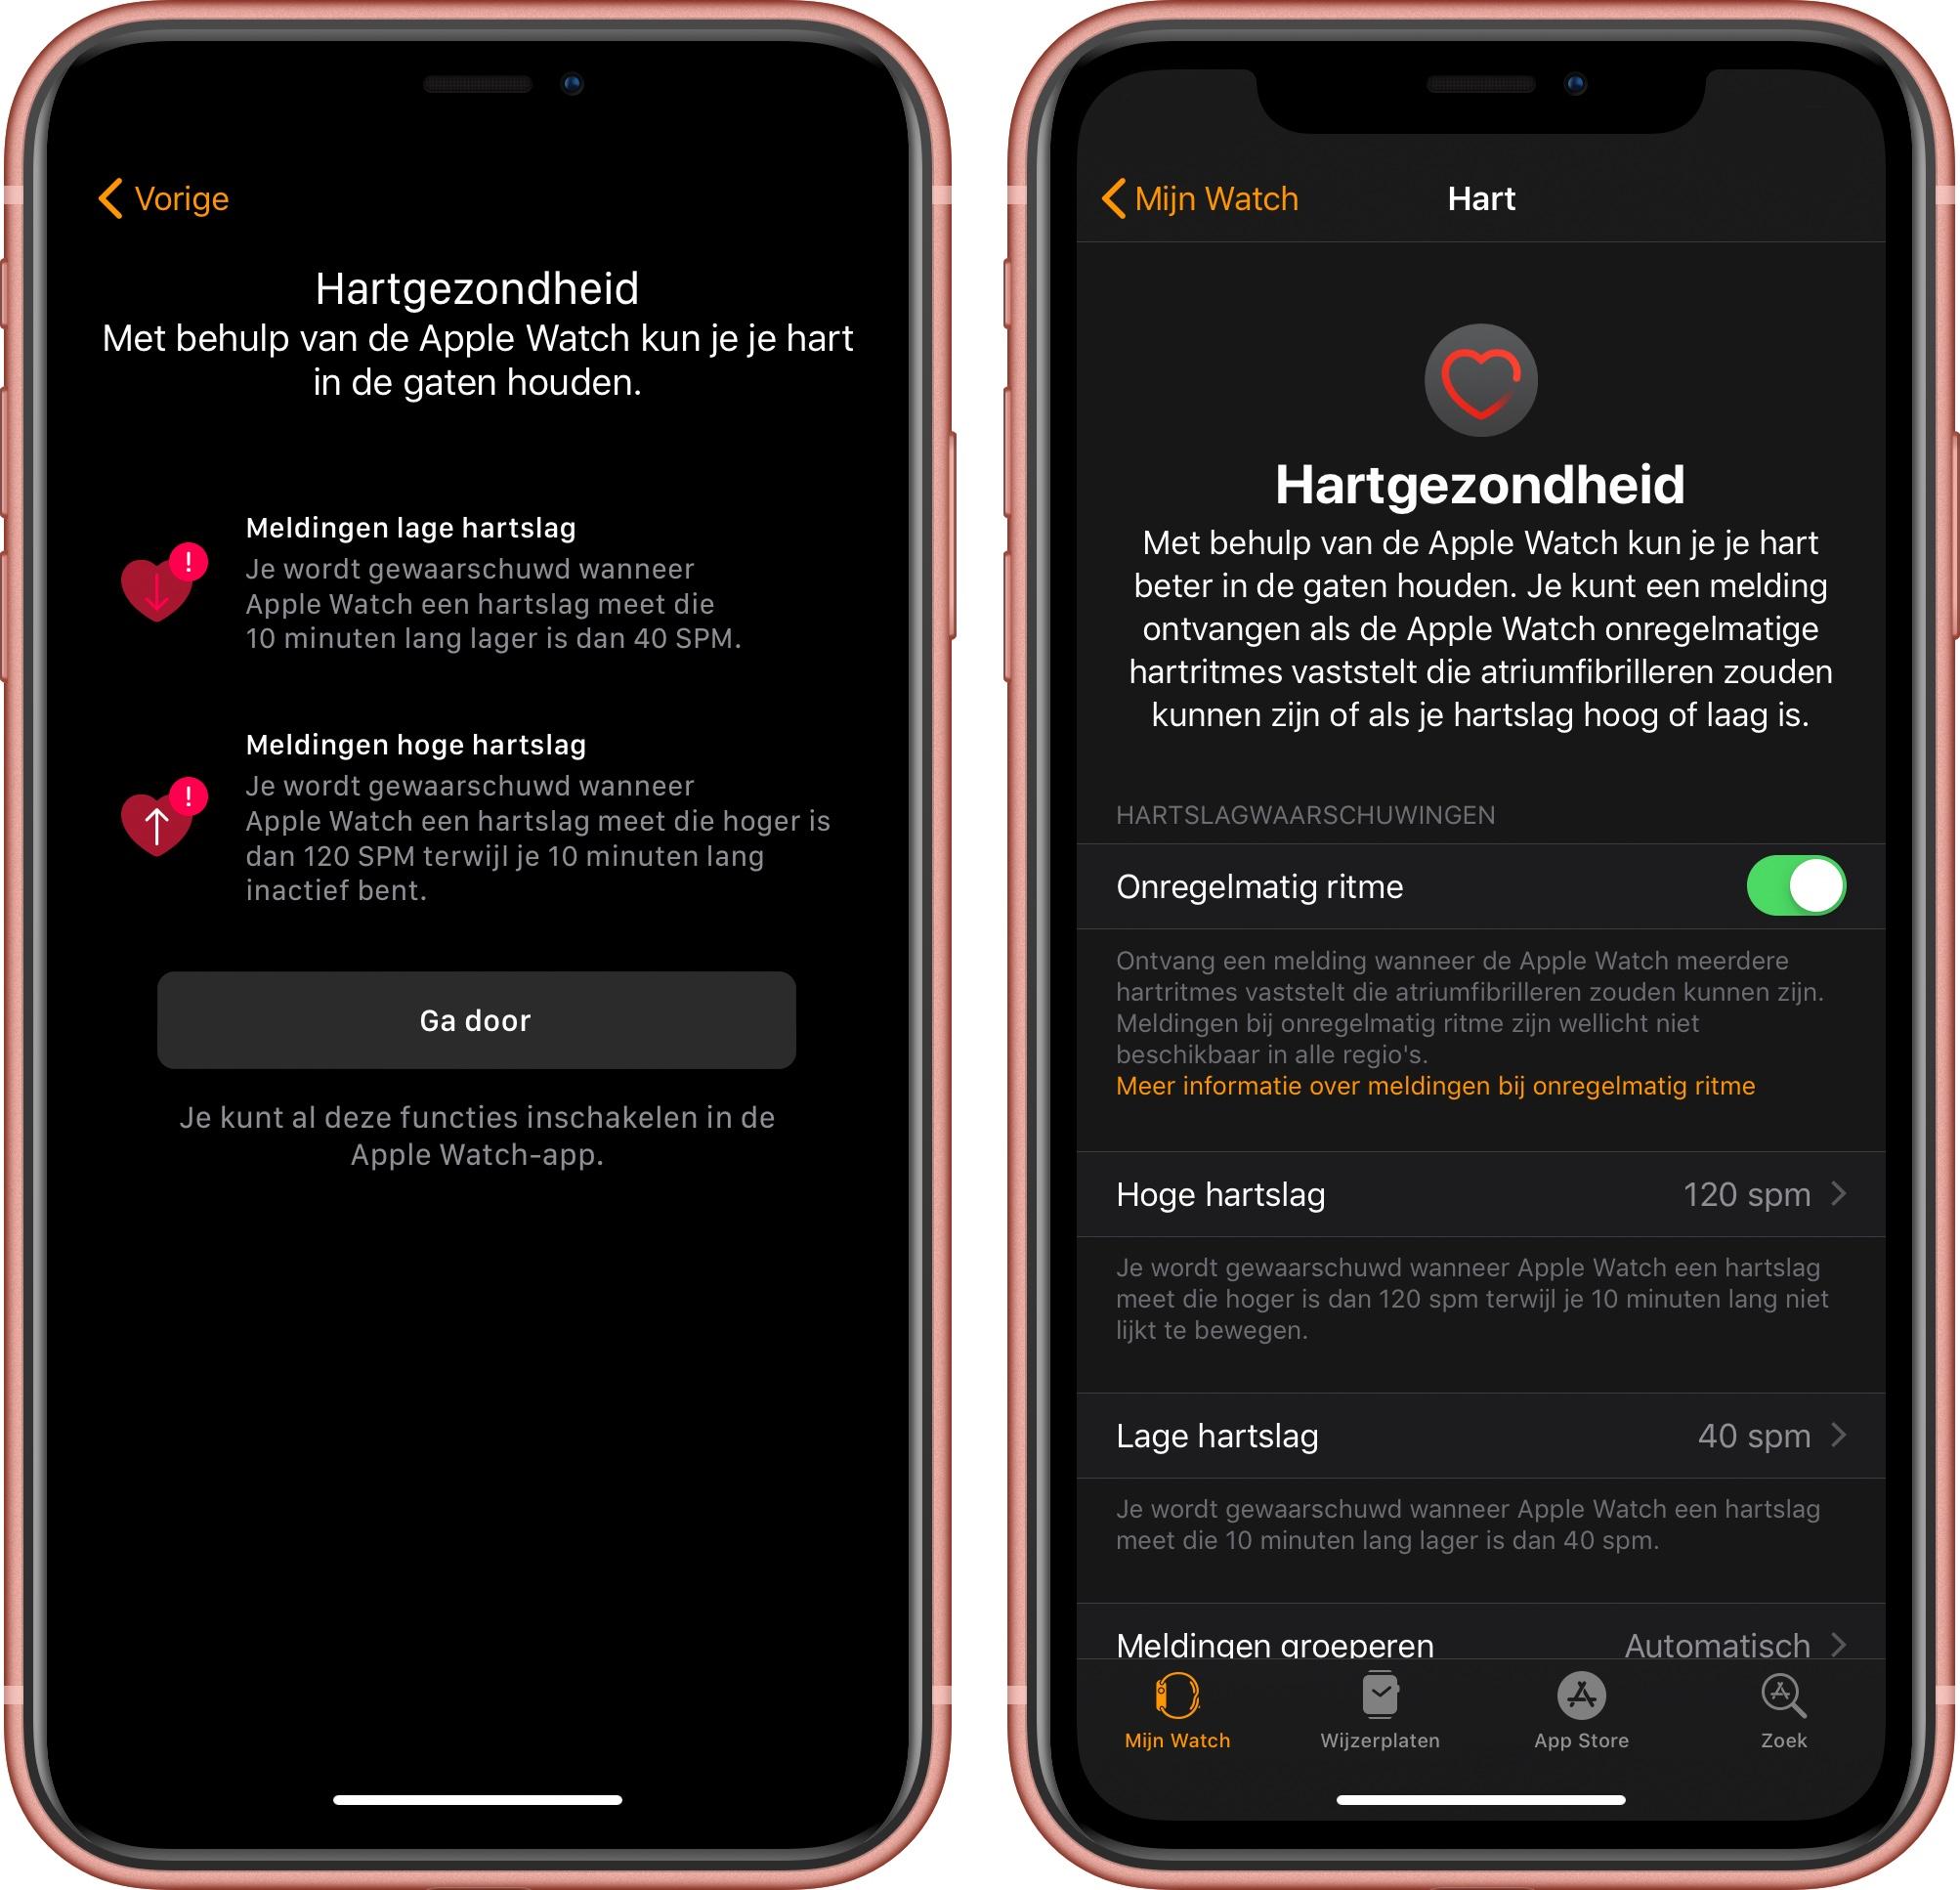 Apple Watch hartmonitoring 001